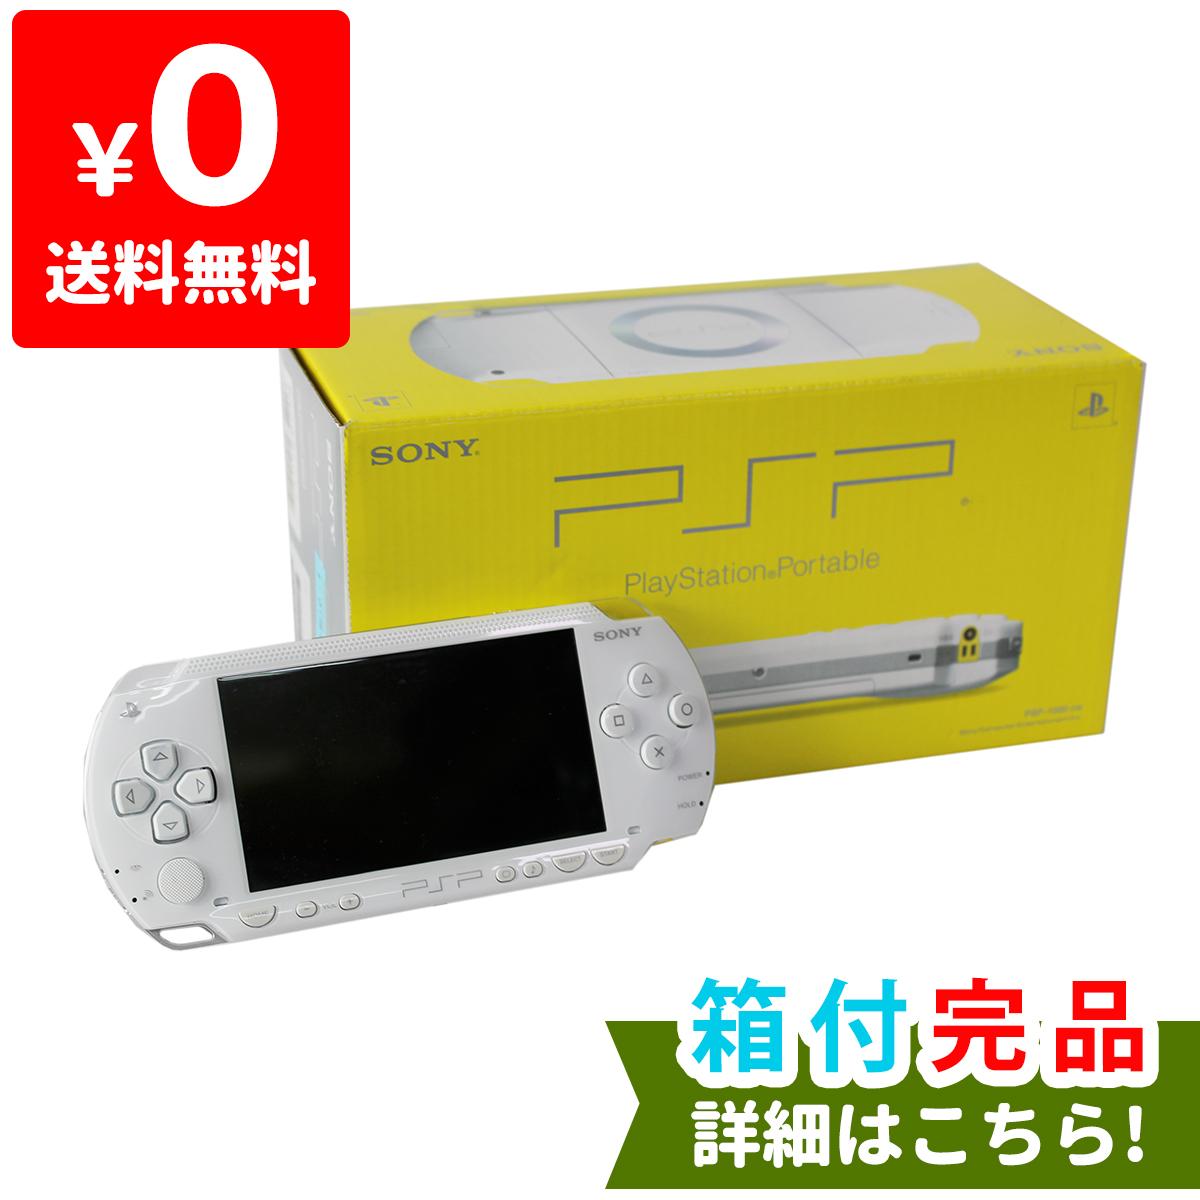 PSP 1000 セラミック・ホワイト (PSP-1000CW) 本体 完品 外箱付き PlayStationPortable SONY ソニー 中古 4948872411219 送料無料 【中古】